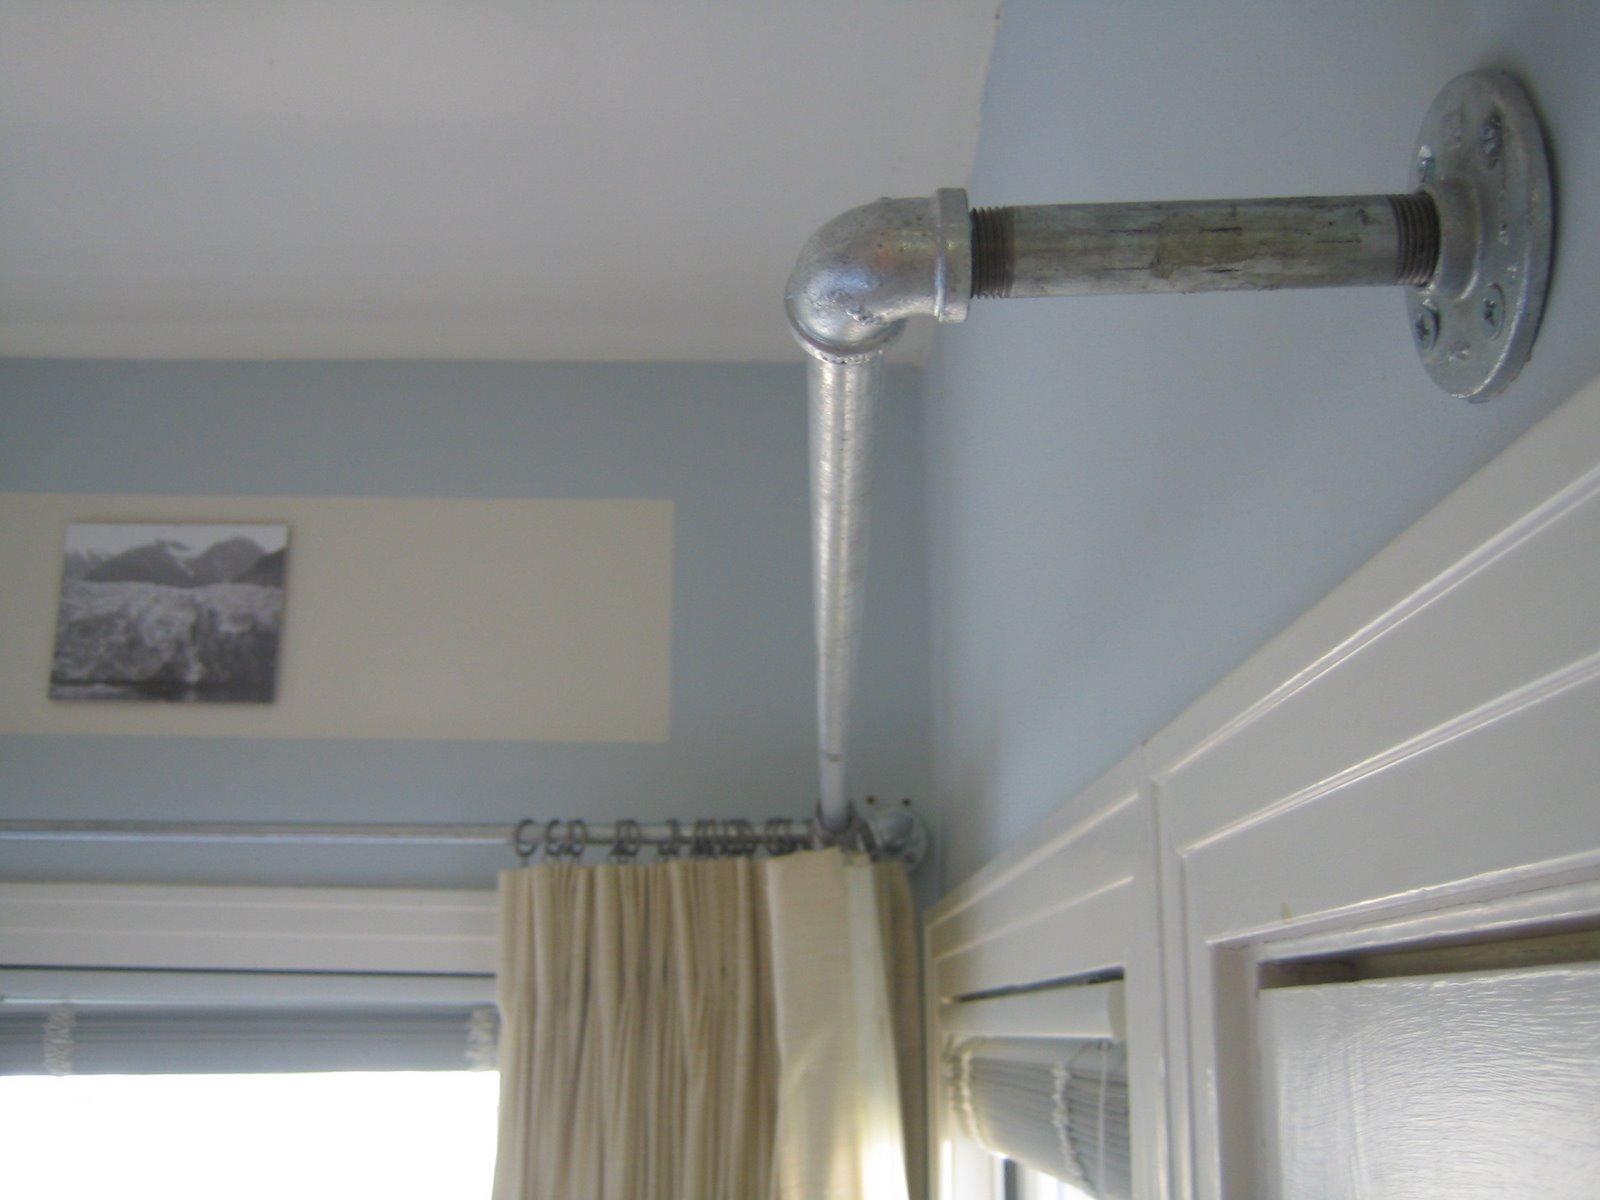 Closet curtain rod